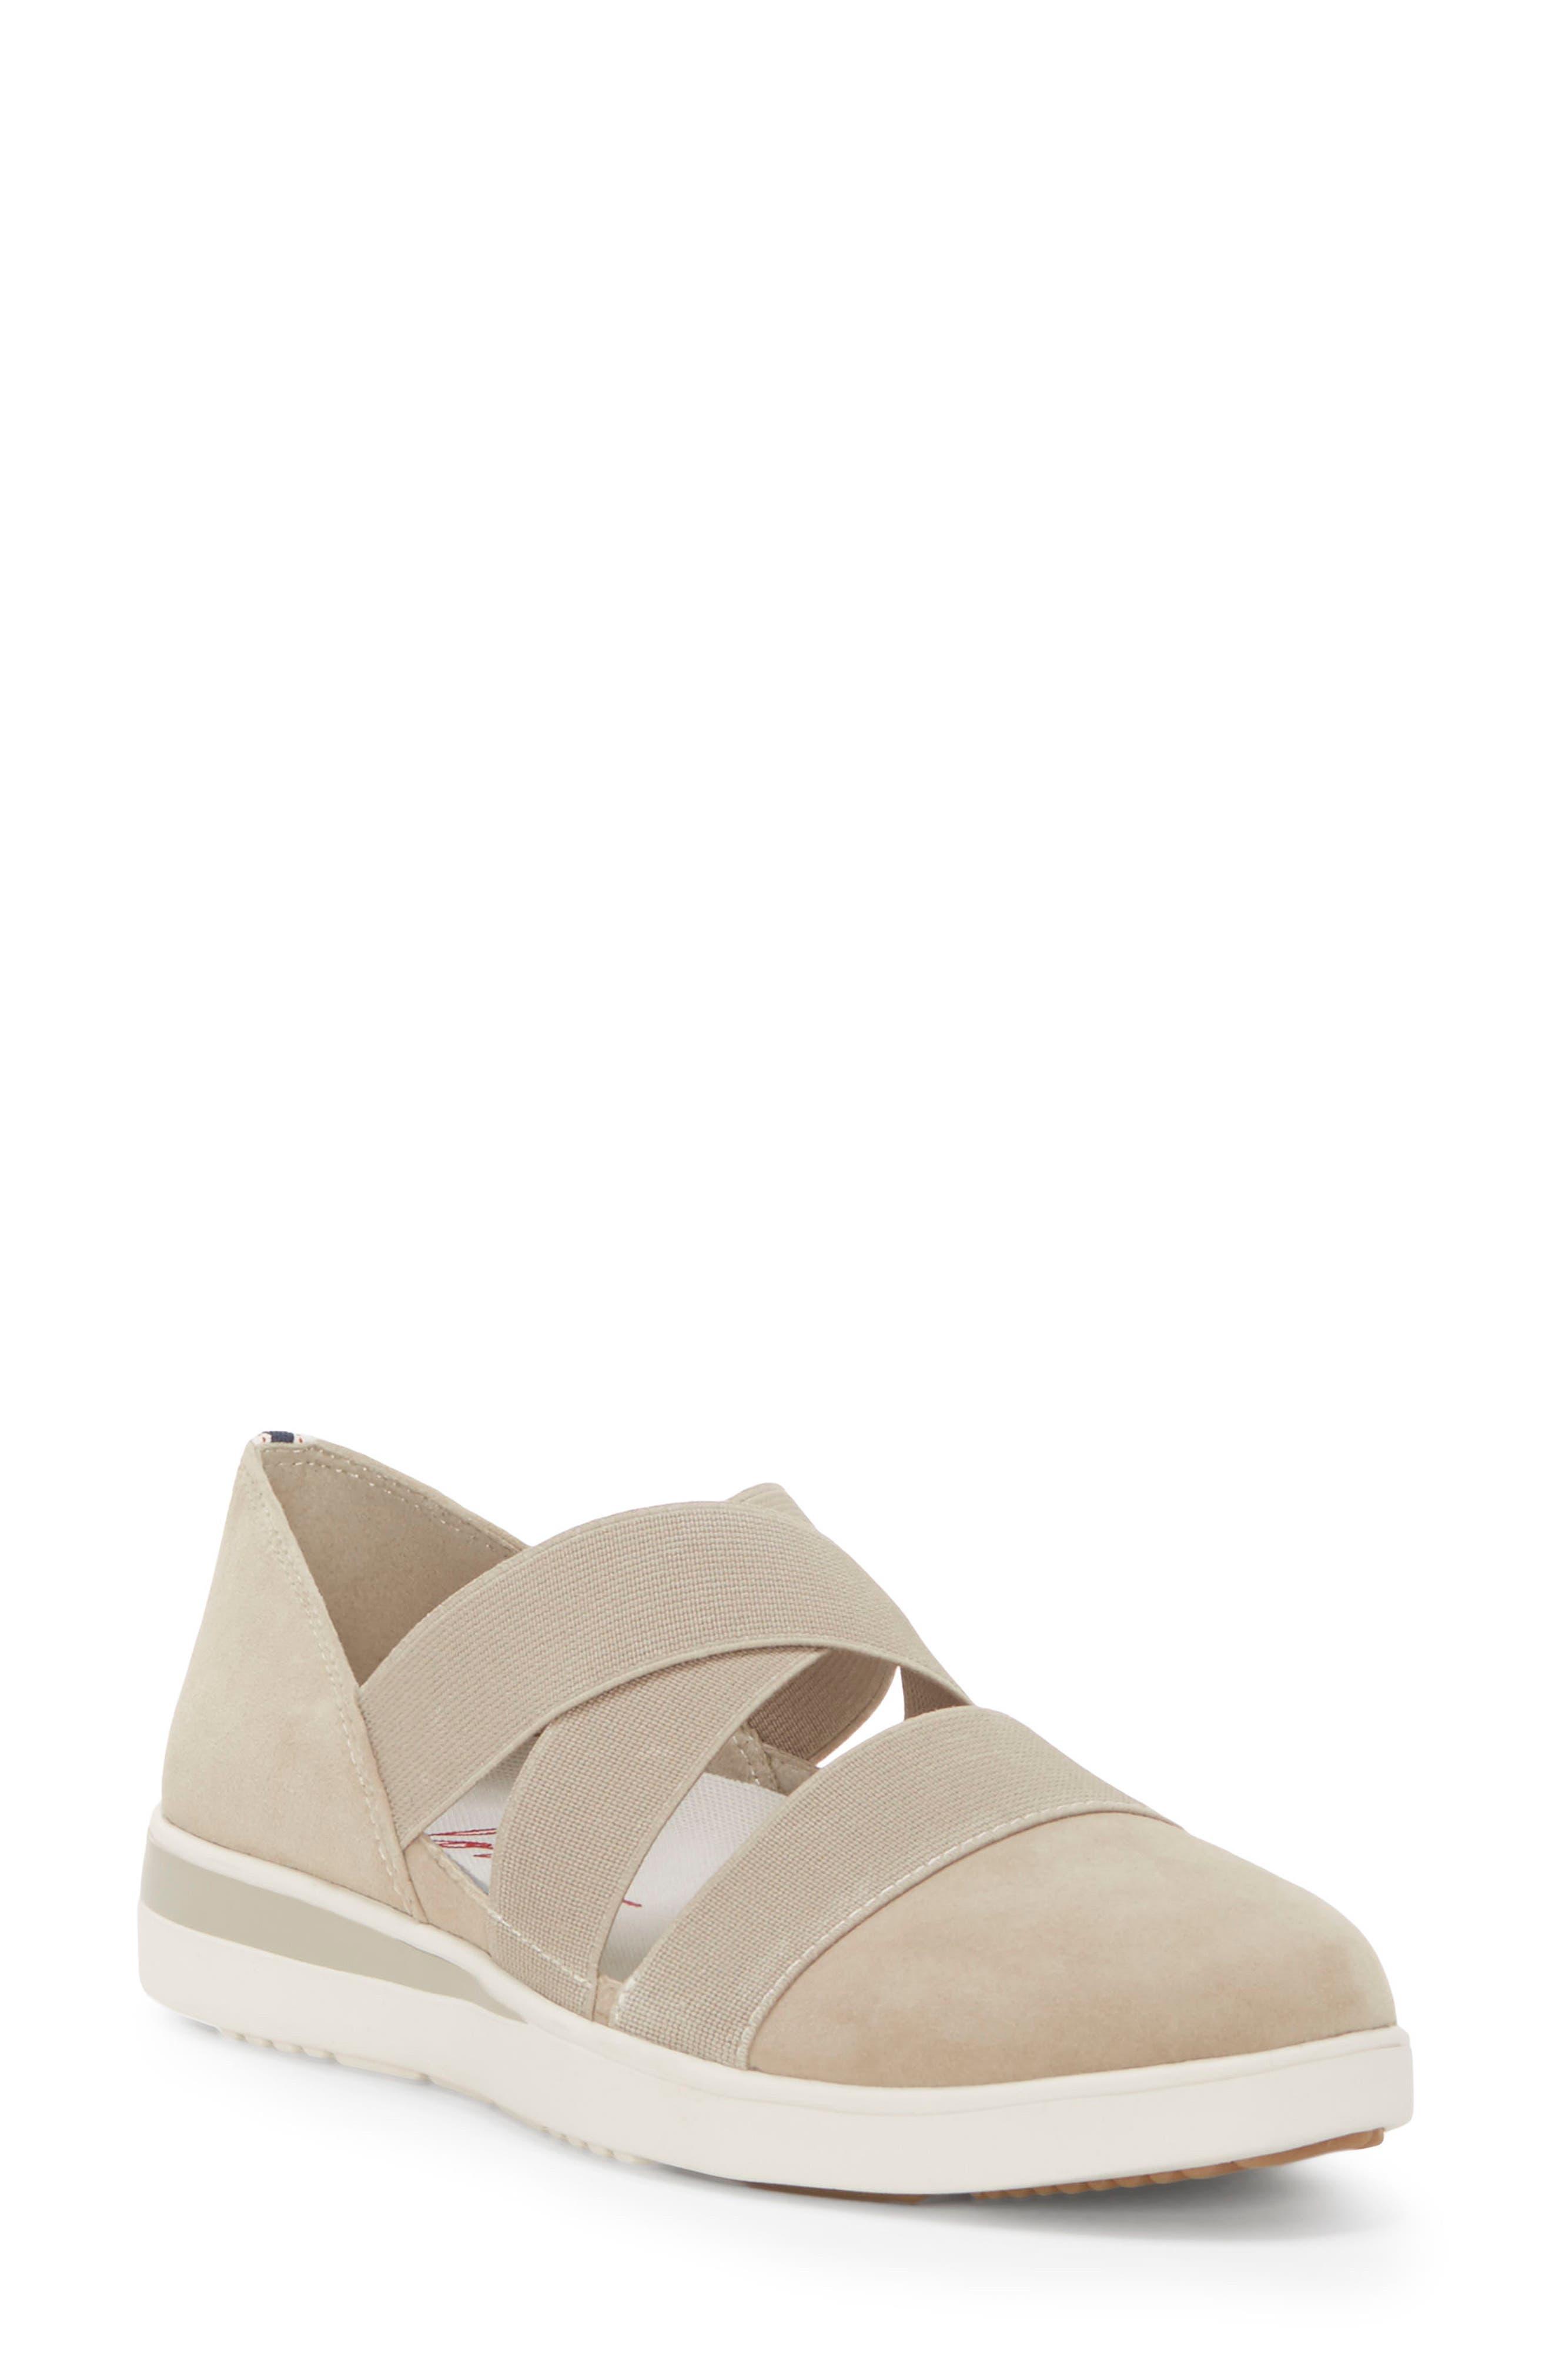 Alskara Slip-On Sneaker Flat,                         Main,                         color, 210